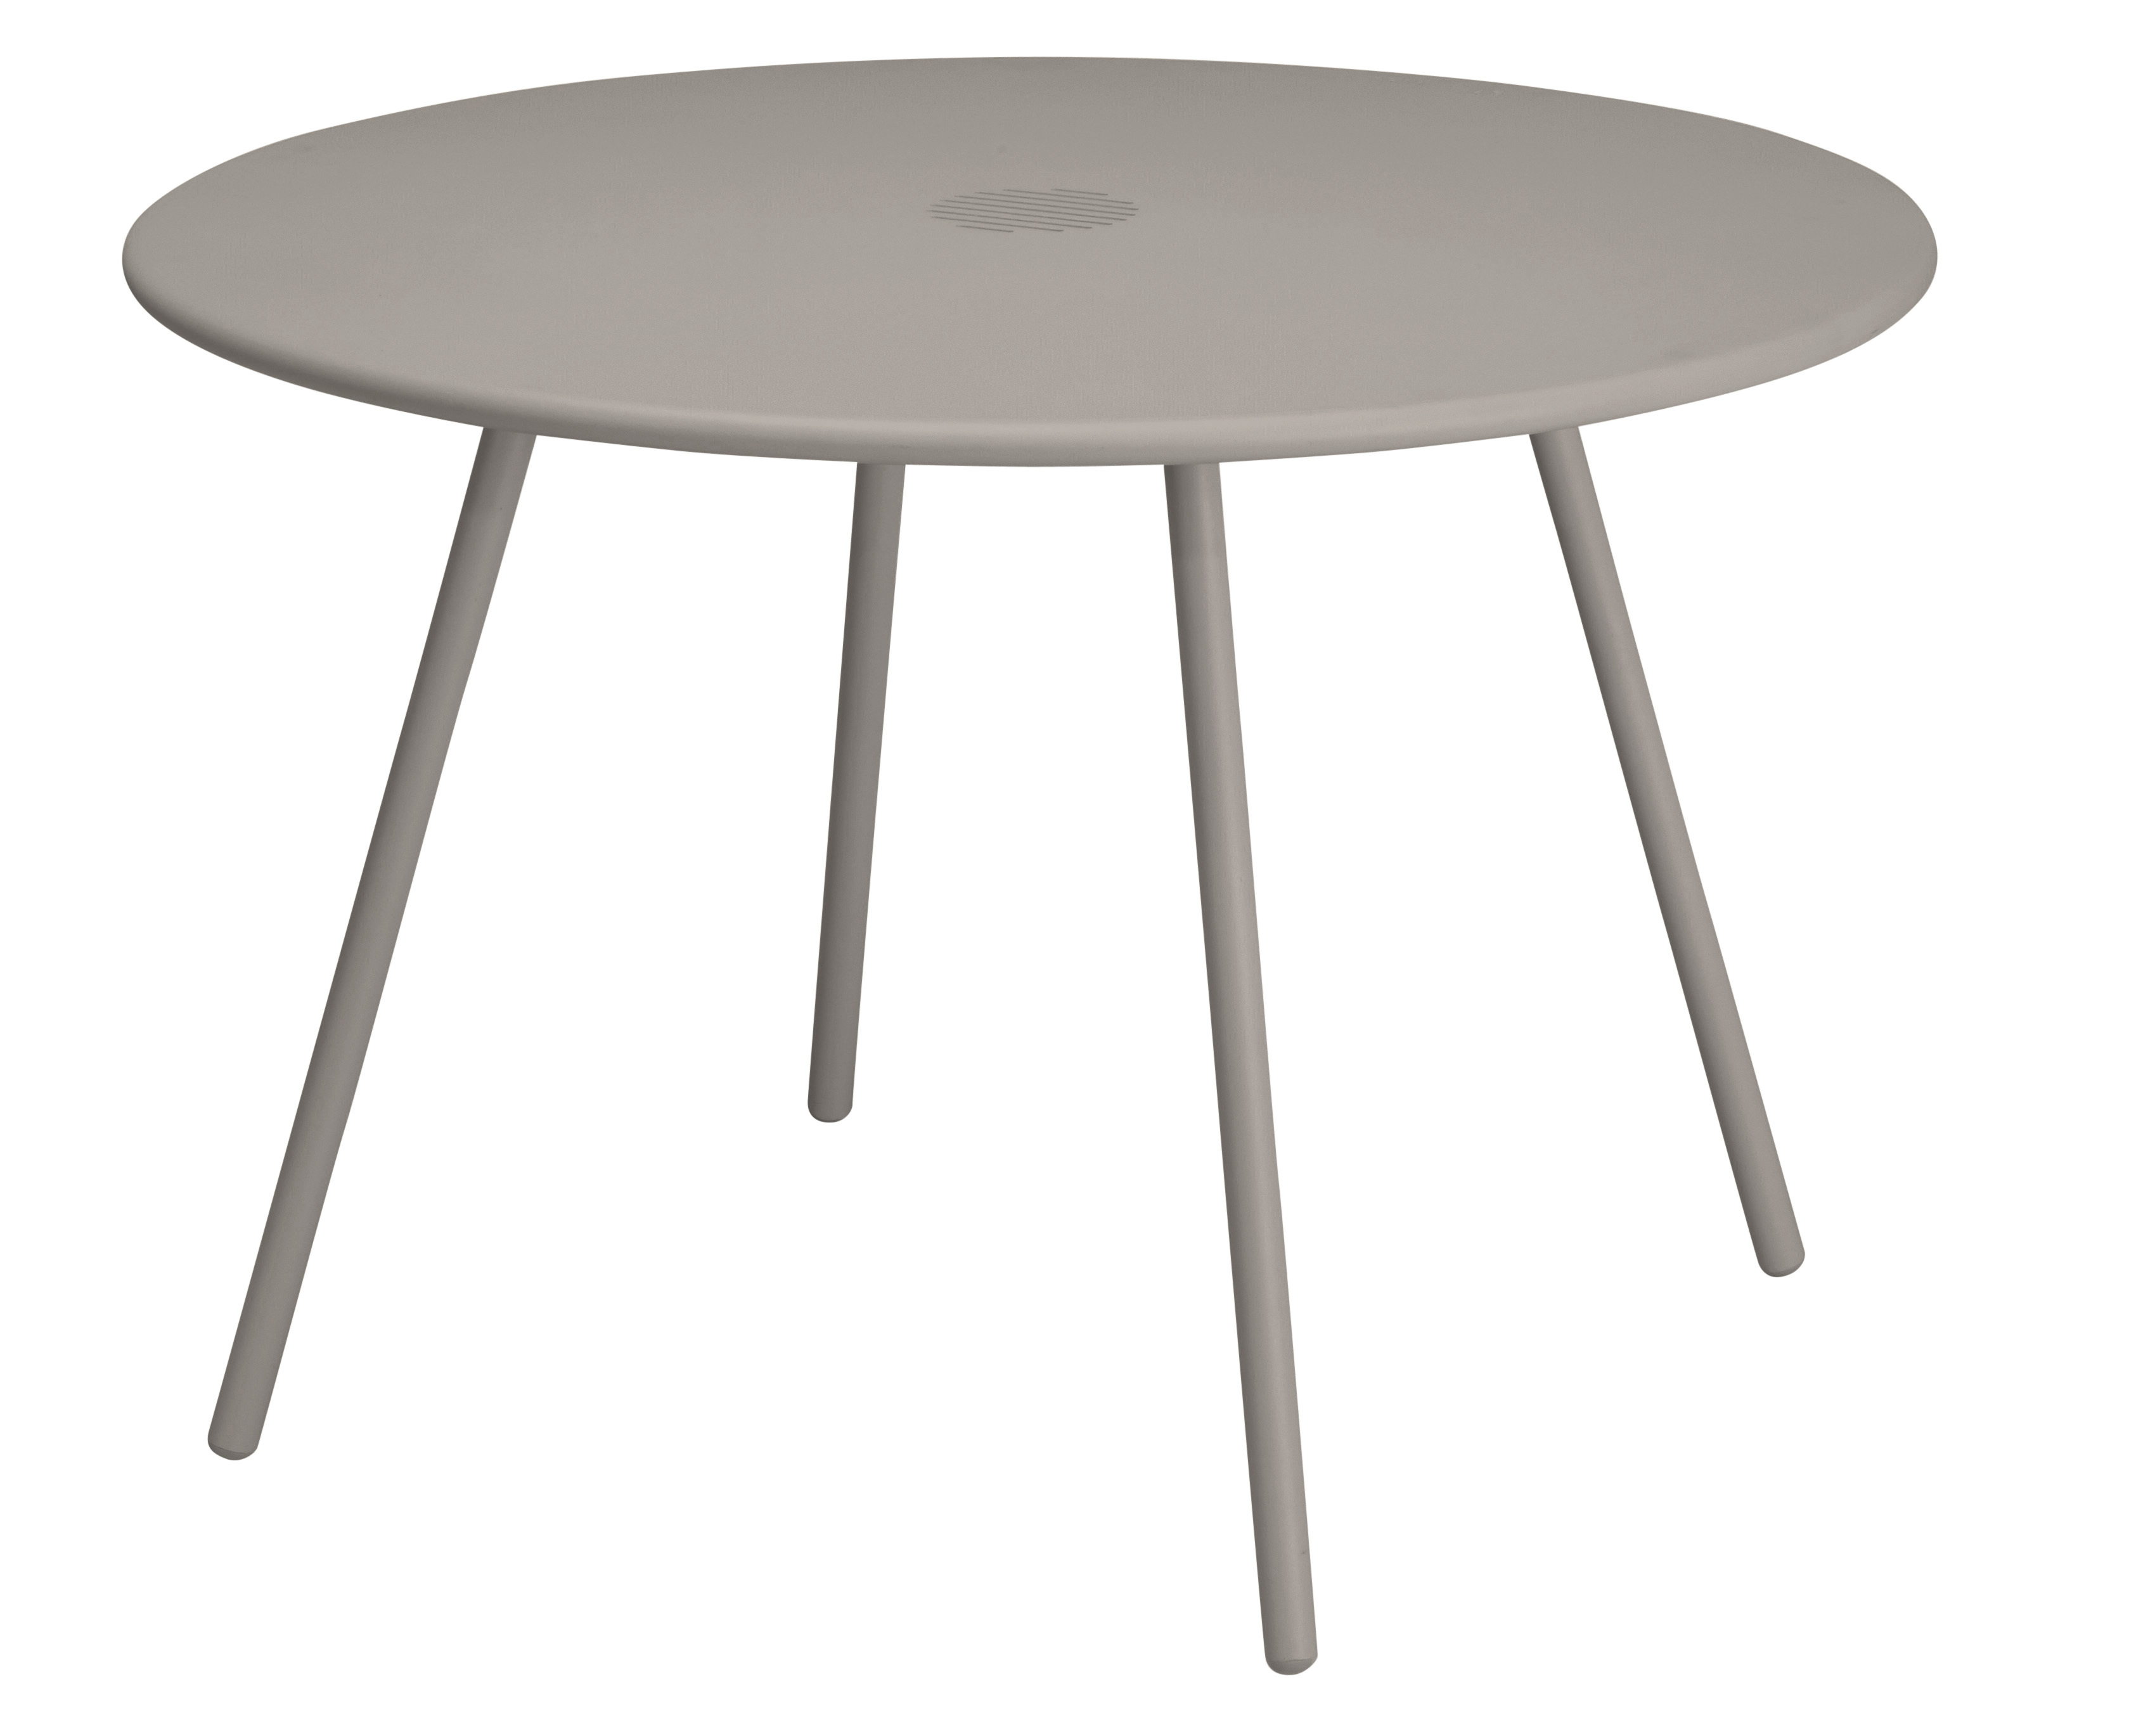 HYBA - Table ronde de jardin Alu 151 - Taupe - pas cher Achat ...